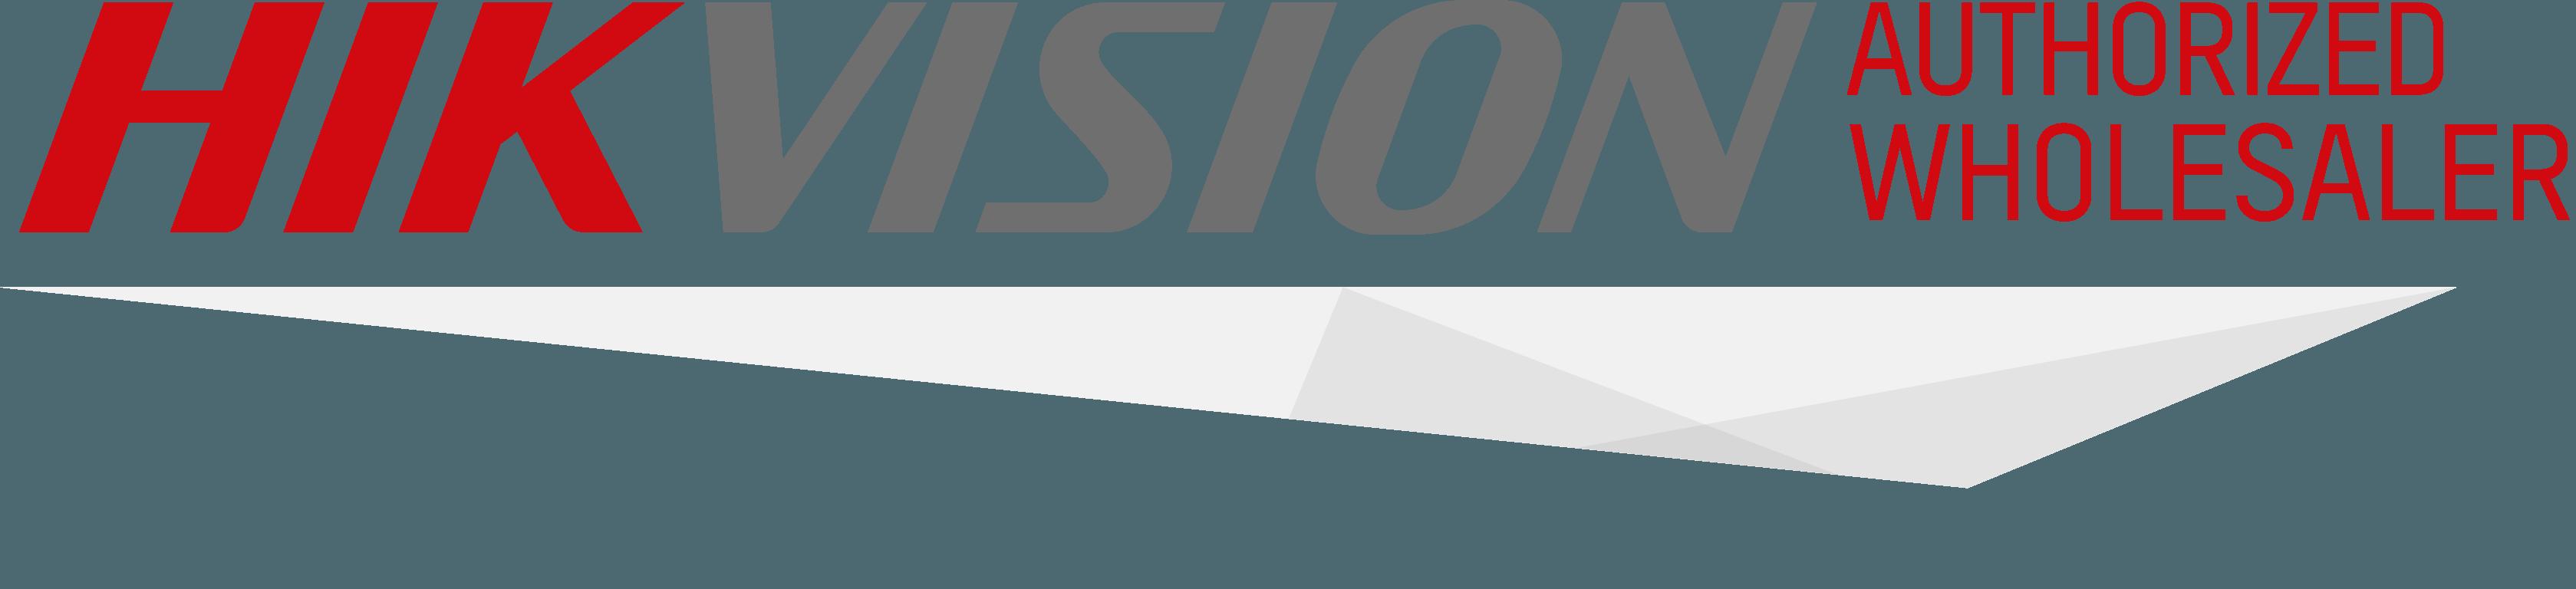 hikvision-authorized-wholesaler.png